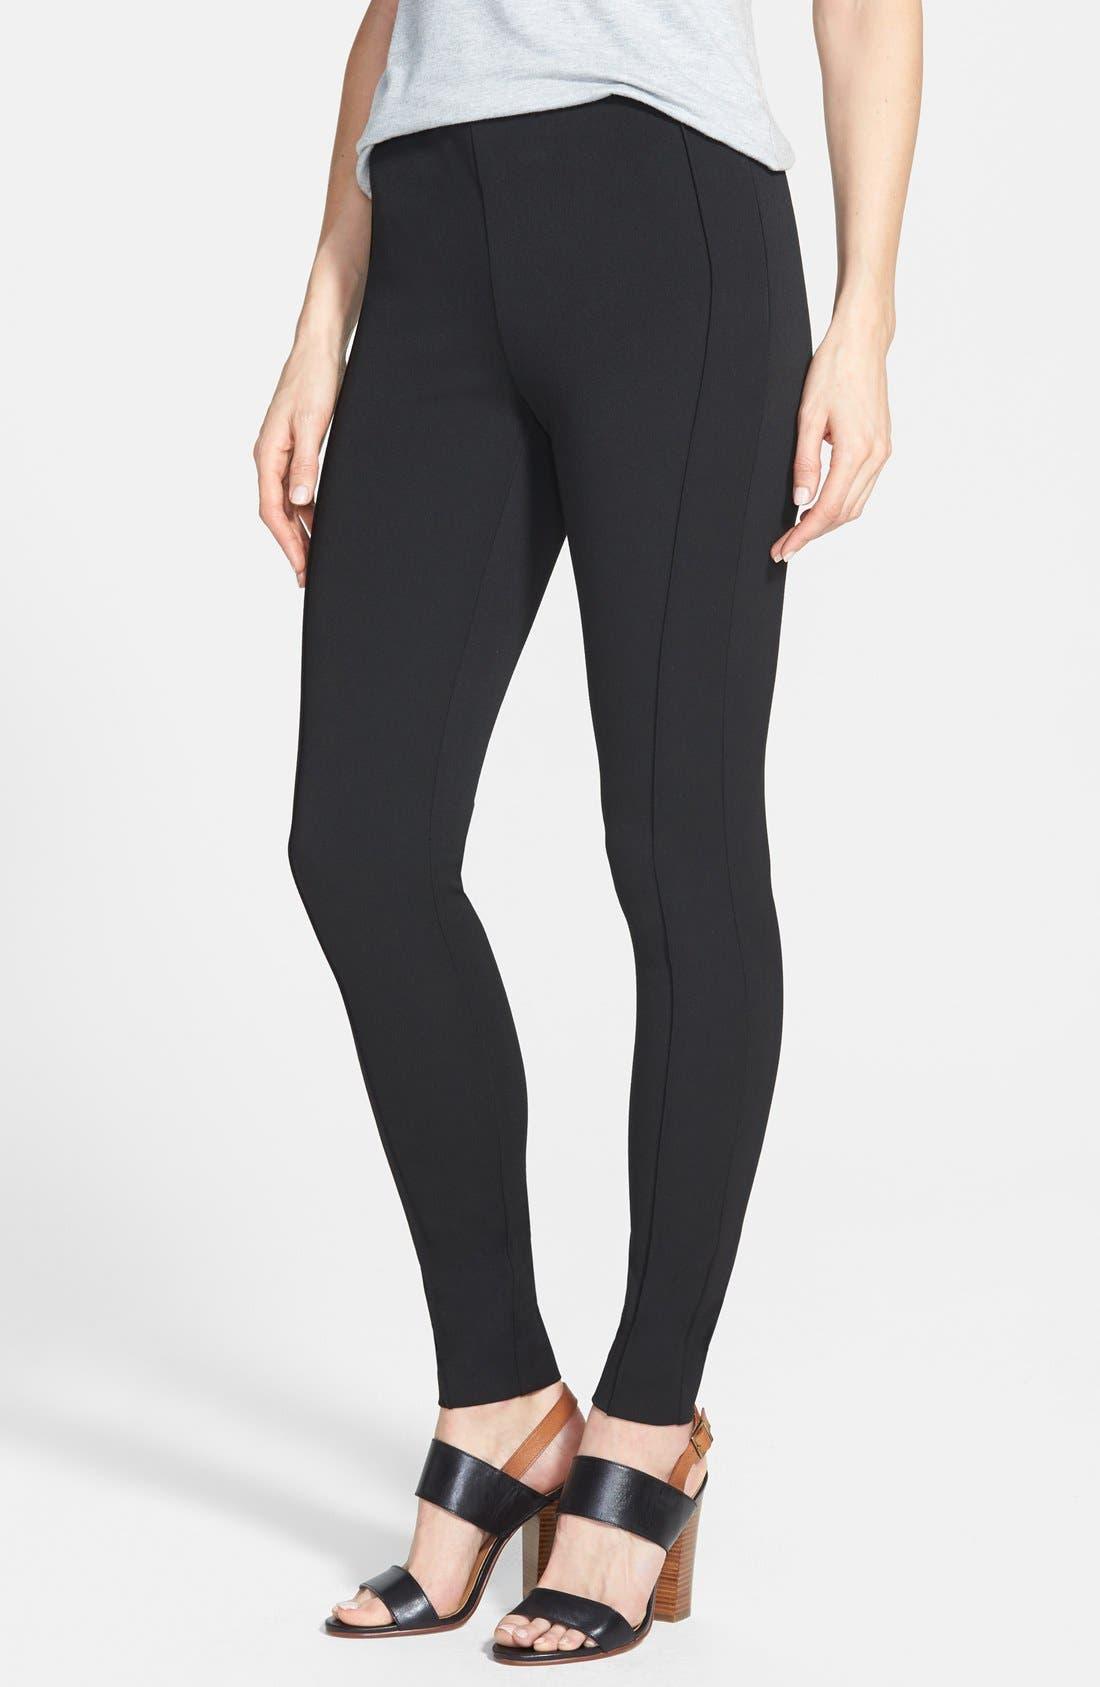 Alternate Image 1 Selected - Vince Camuto Side Zip Skinny Pants (Regular & Petite)